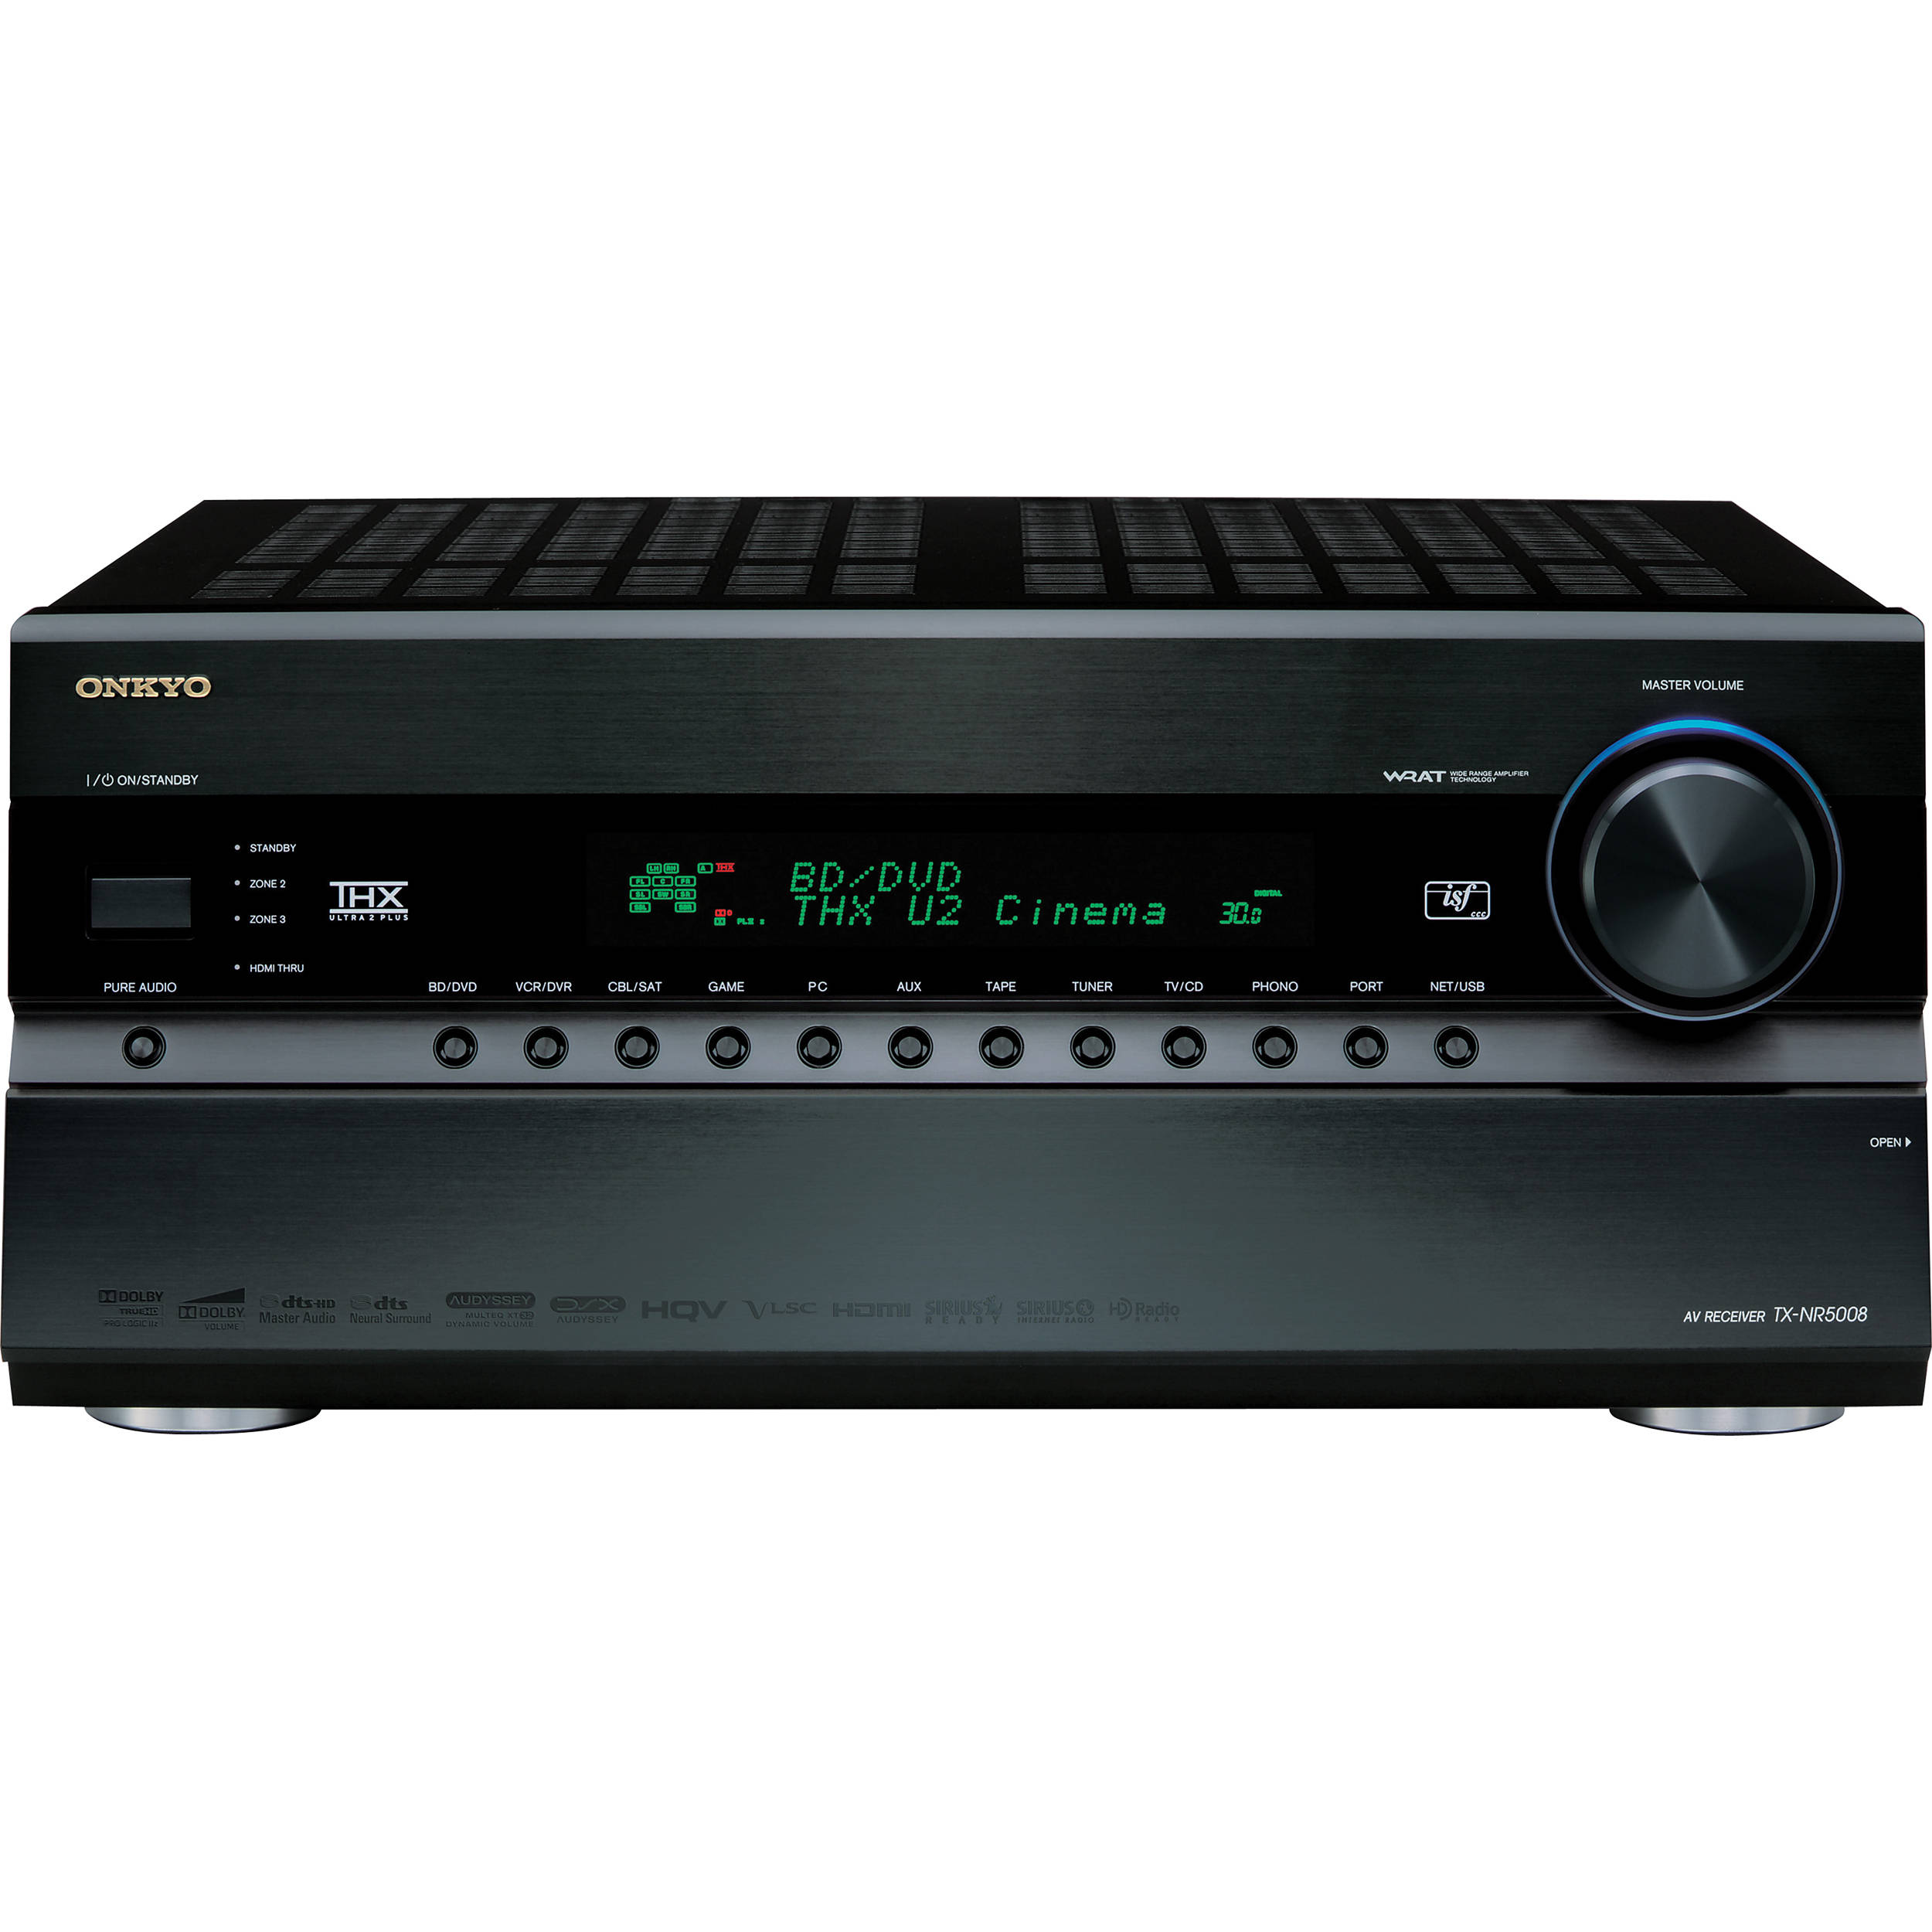 Onkyo TX-NR5008 Network A/V Receiver Update